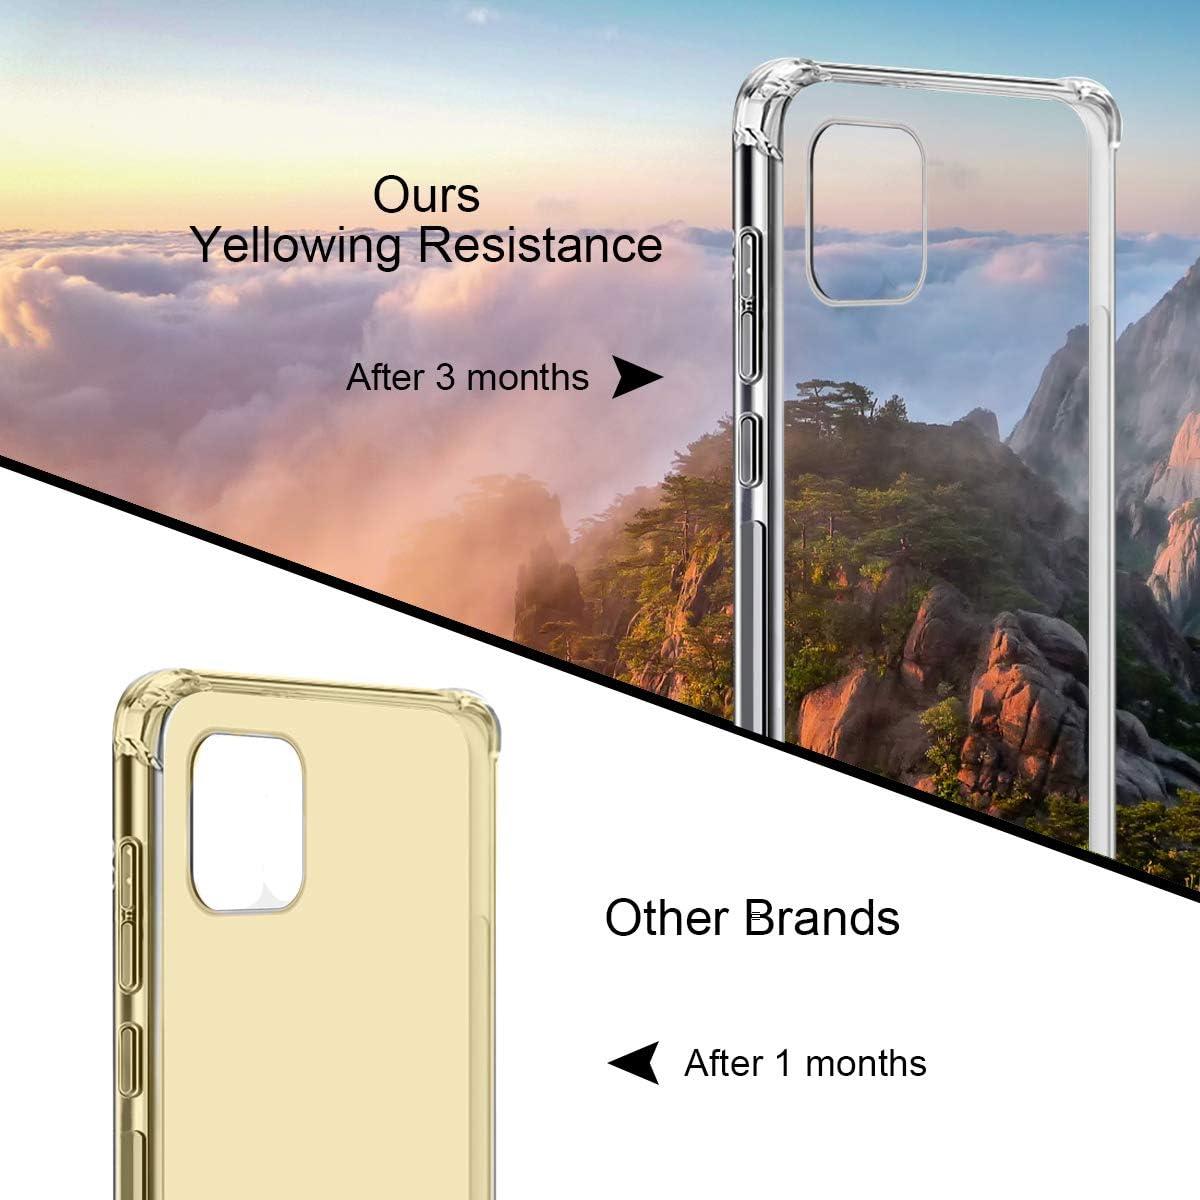 Suave TPU Transparente Gel Silicona Anti-ca/ída Protectora Carcasa para iPhone 12 Mini 5G 5,4 Pulgadas Cristal Templado Protector de Pantalla Reshias Funda para iPhone 12 Mini con 2 Pack